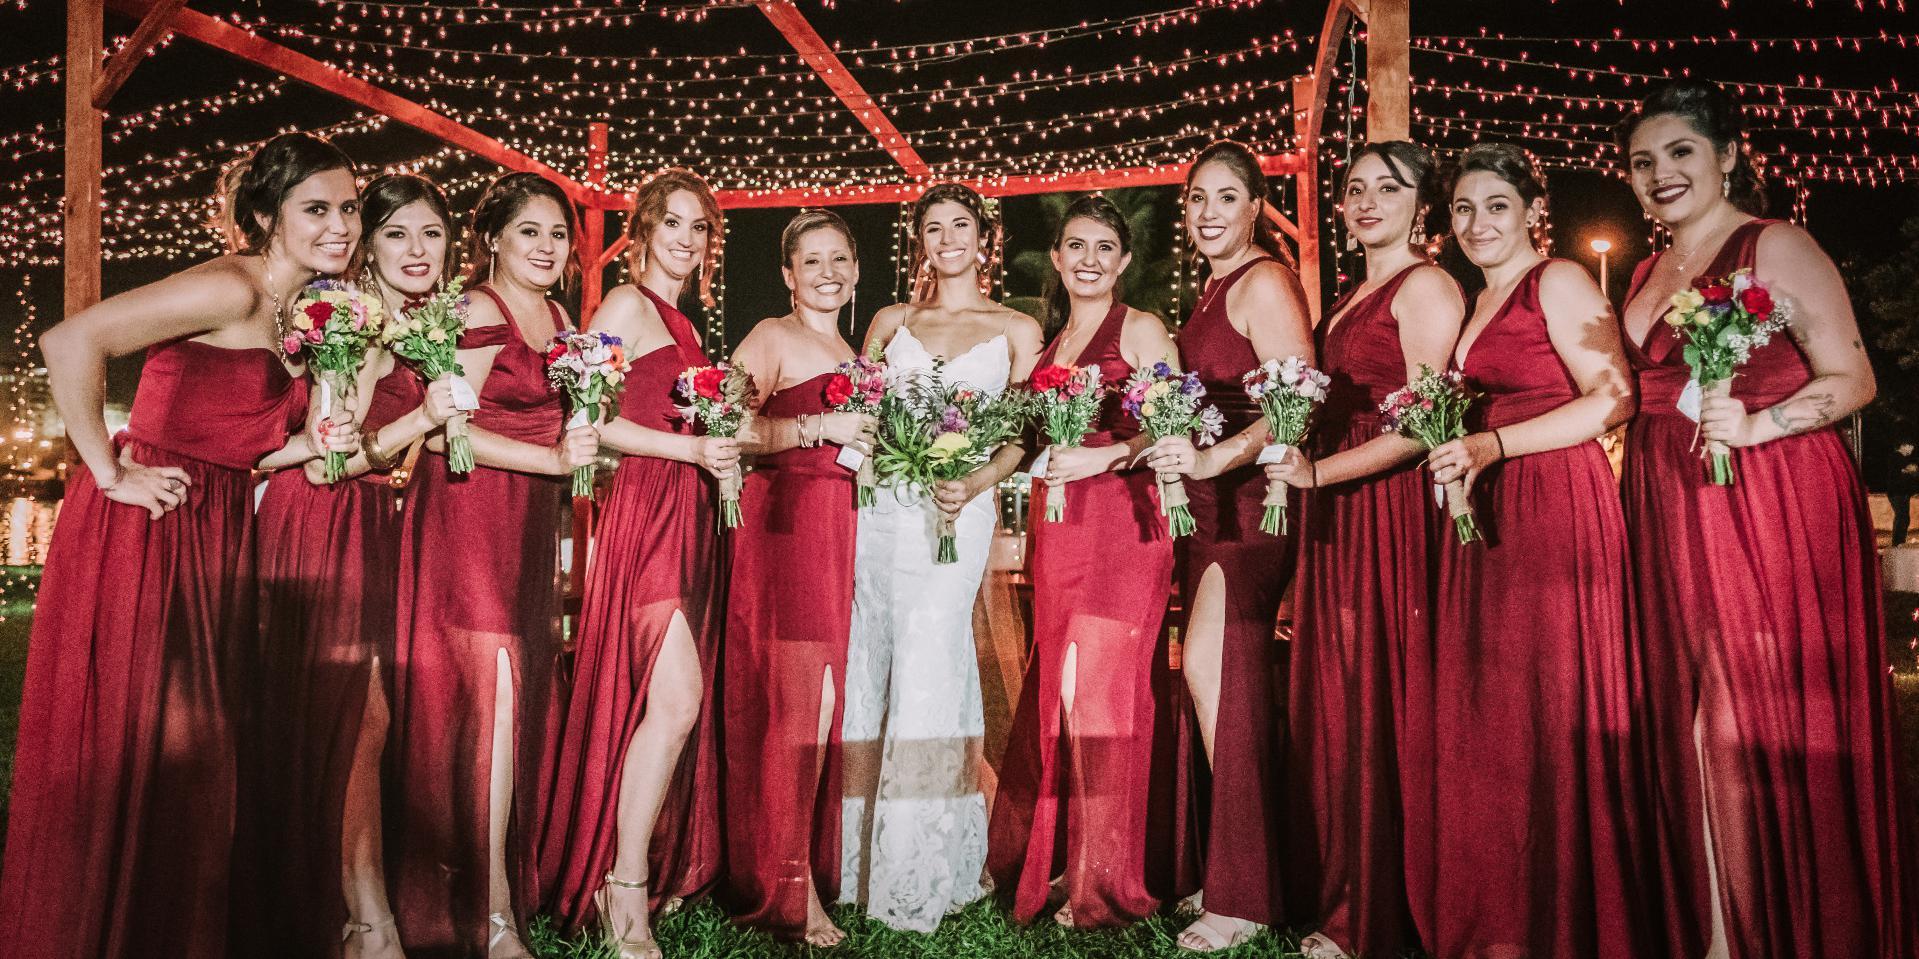 bodas-sin-clasificar-sin-tema-cuba-29441.jpg